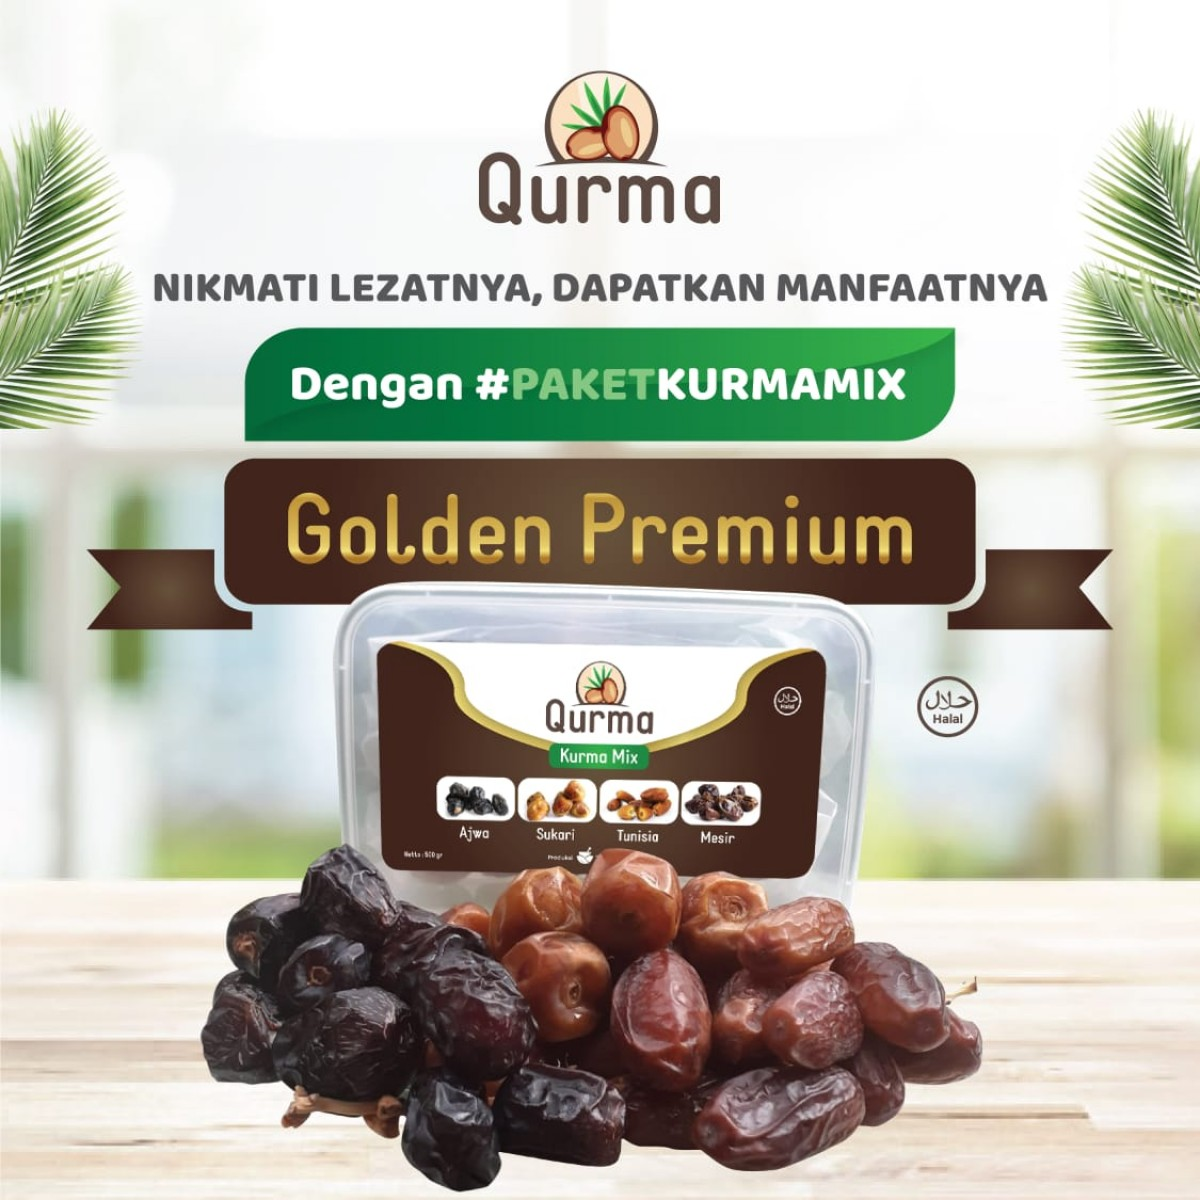 PAKET KURMA MIX PREMIUM ( AJWA - SUKARI - TUNISIA - MADU MESIR) 500 GR